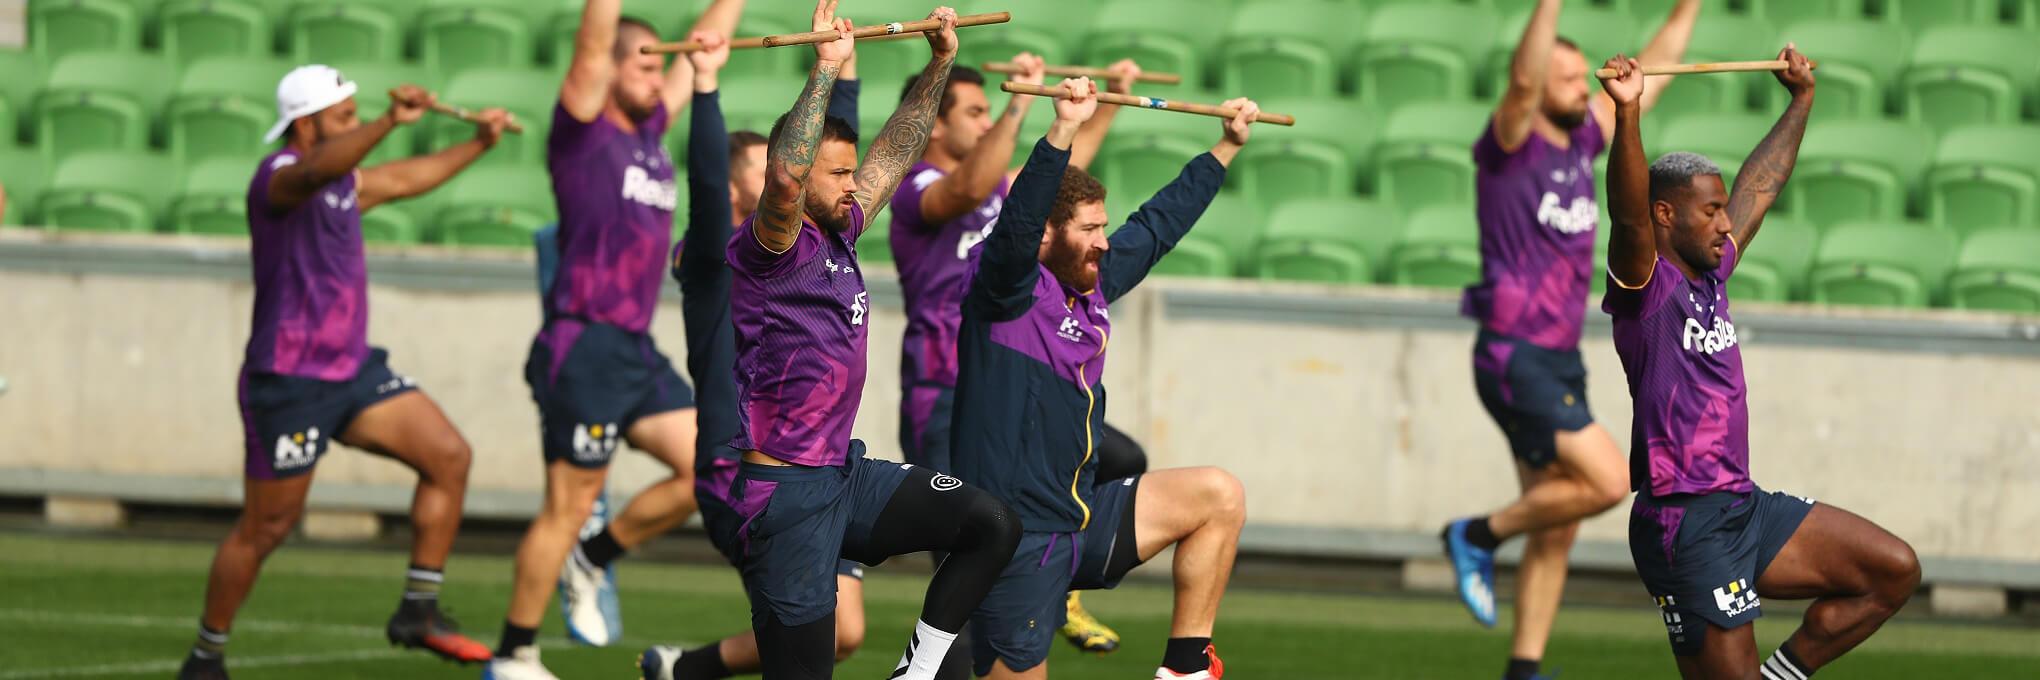 NRL Odds & Picks - Telstra Premiership Rabbitohs vs Storm Round 4